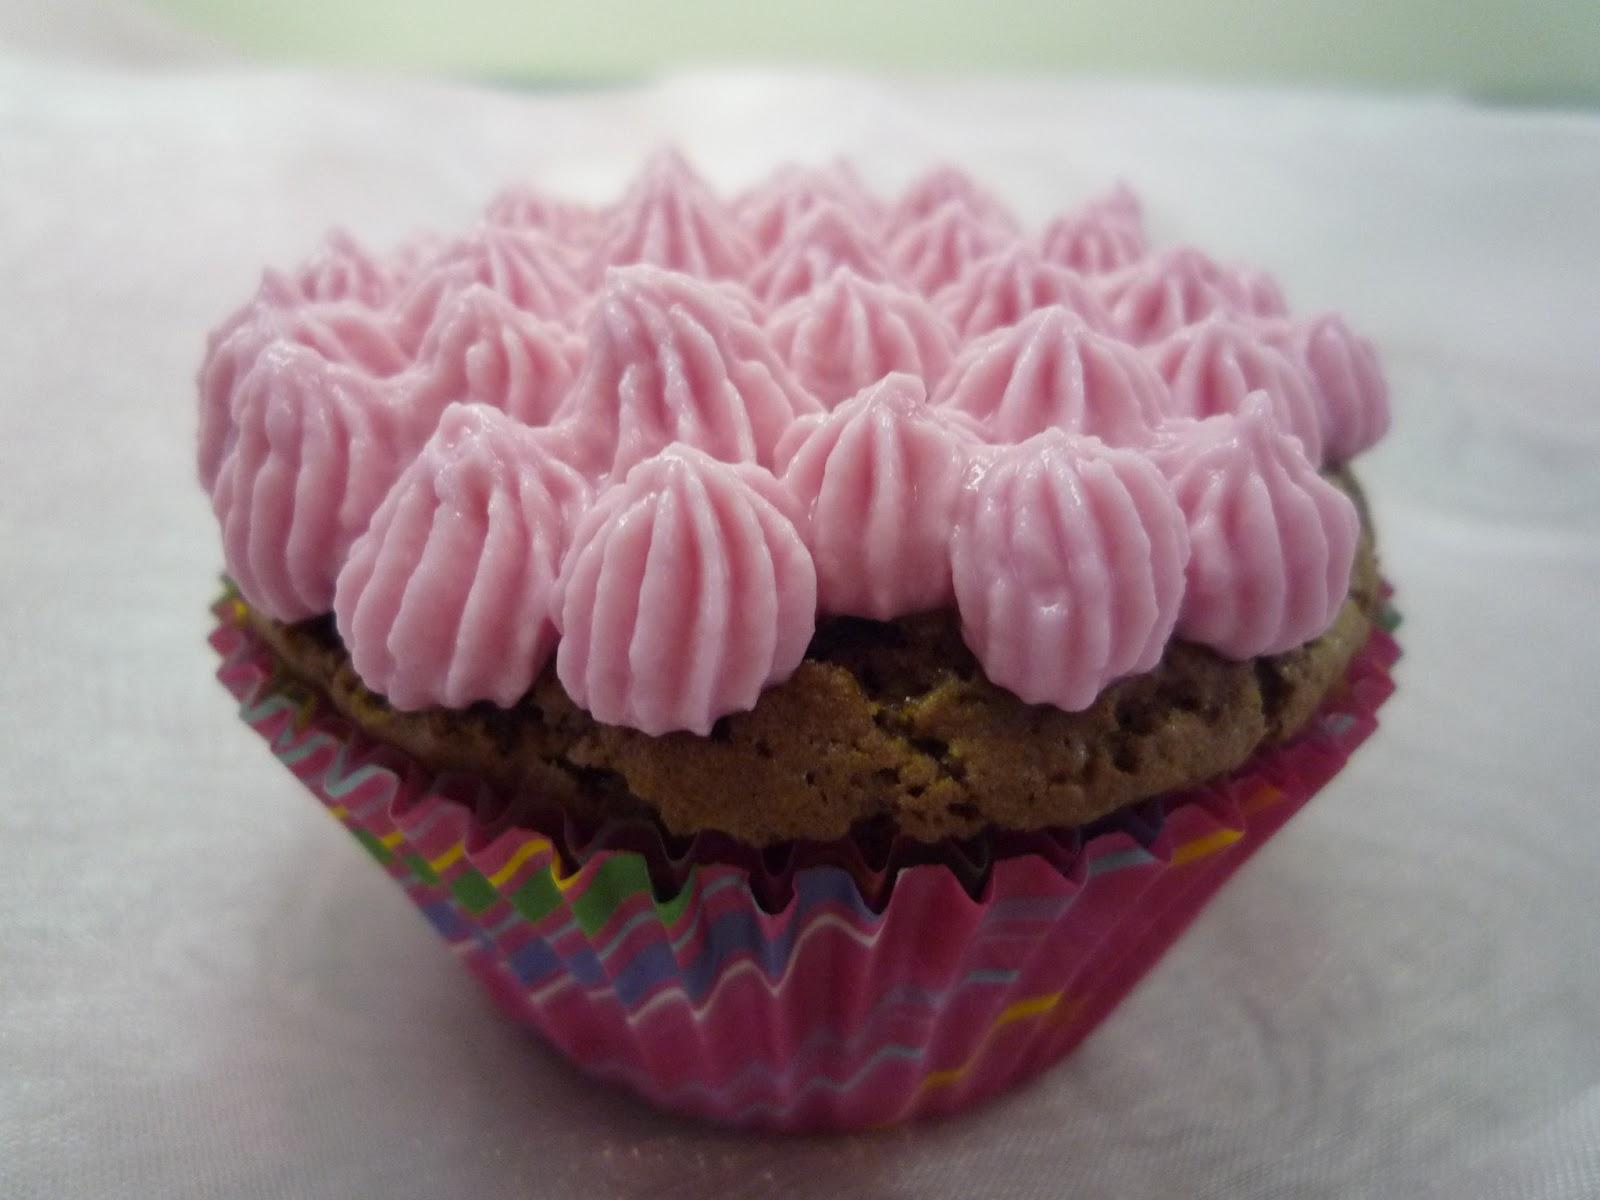 Cupcakes, Schoko-Himbeer-Cupcakes, Schokoladen-Cupcakes, Himbeer-Cupcakes